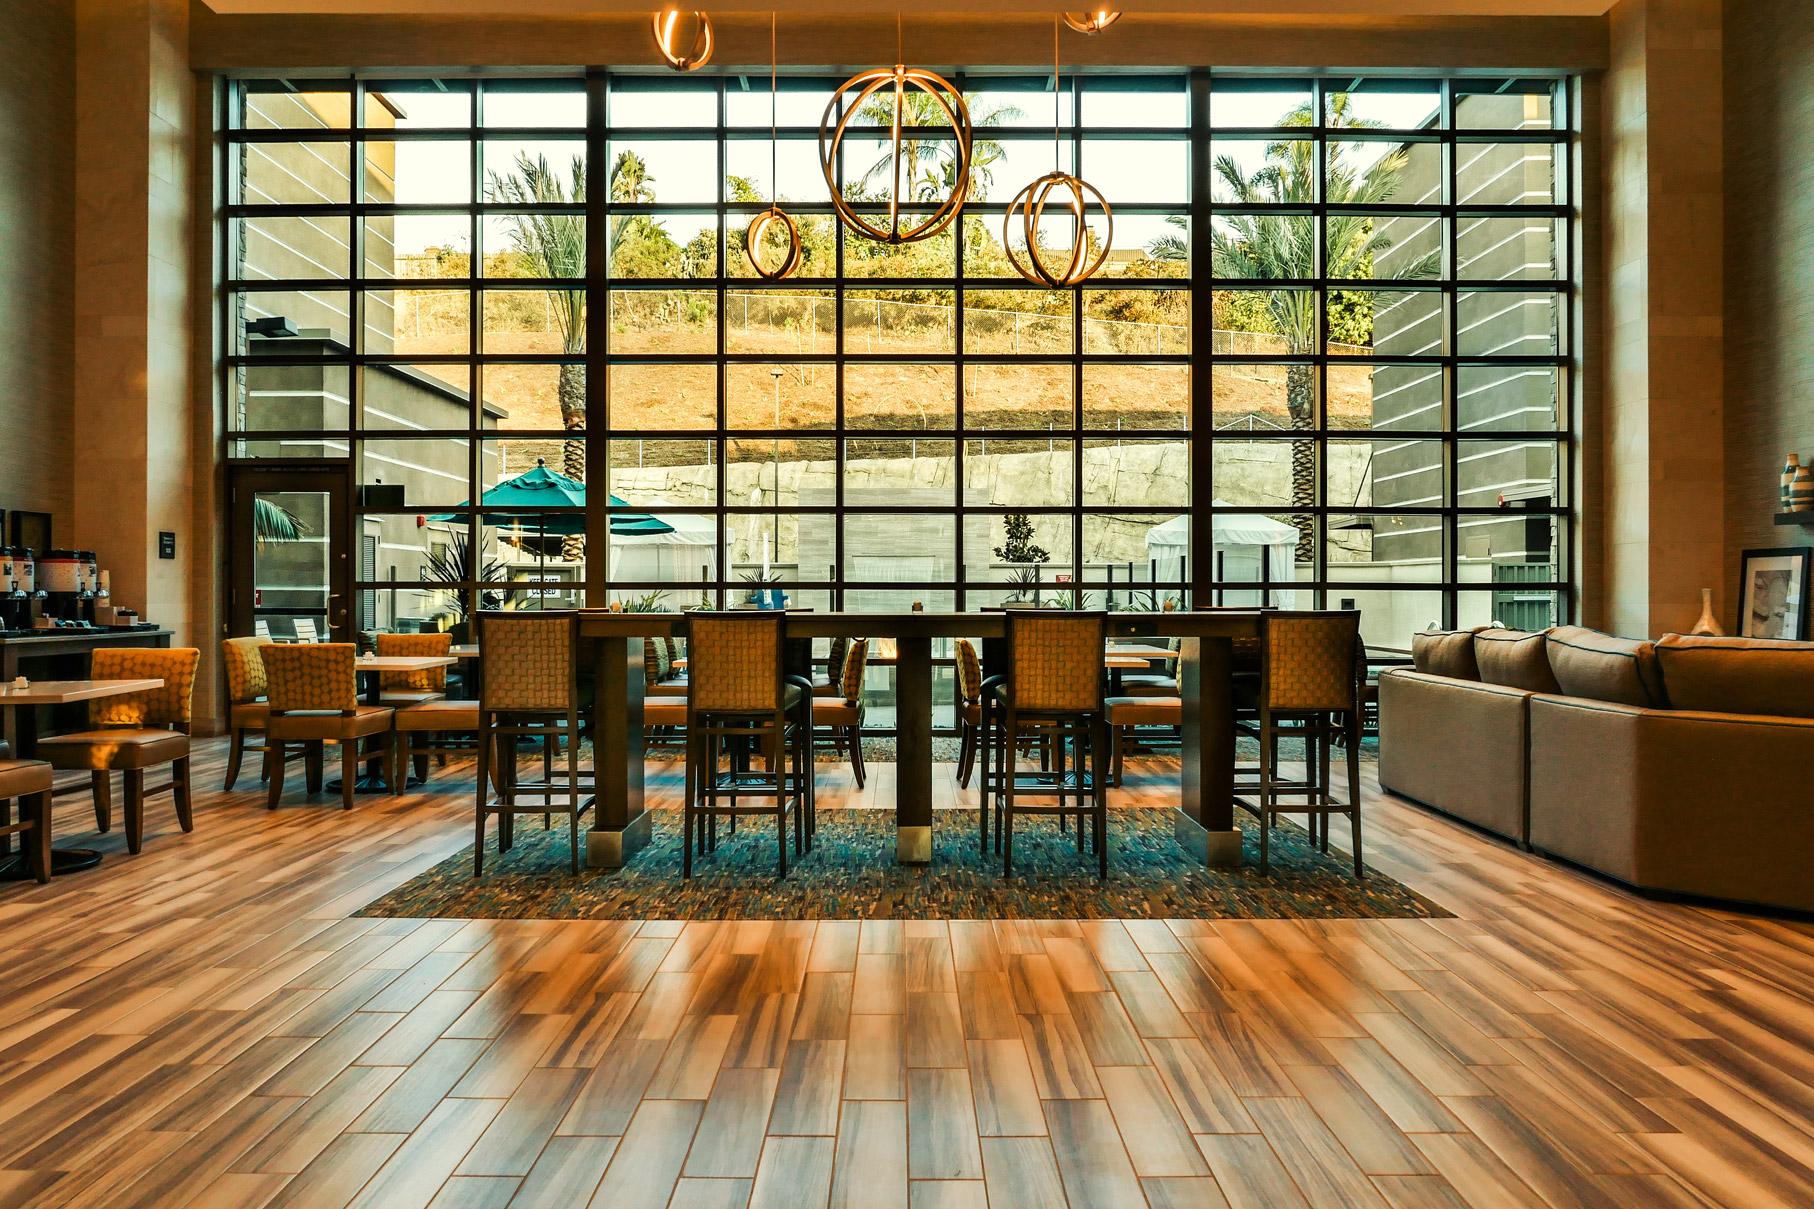 web_Photo-2-Communal-Table-in-Lobby.jpg